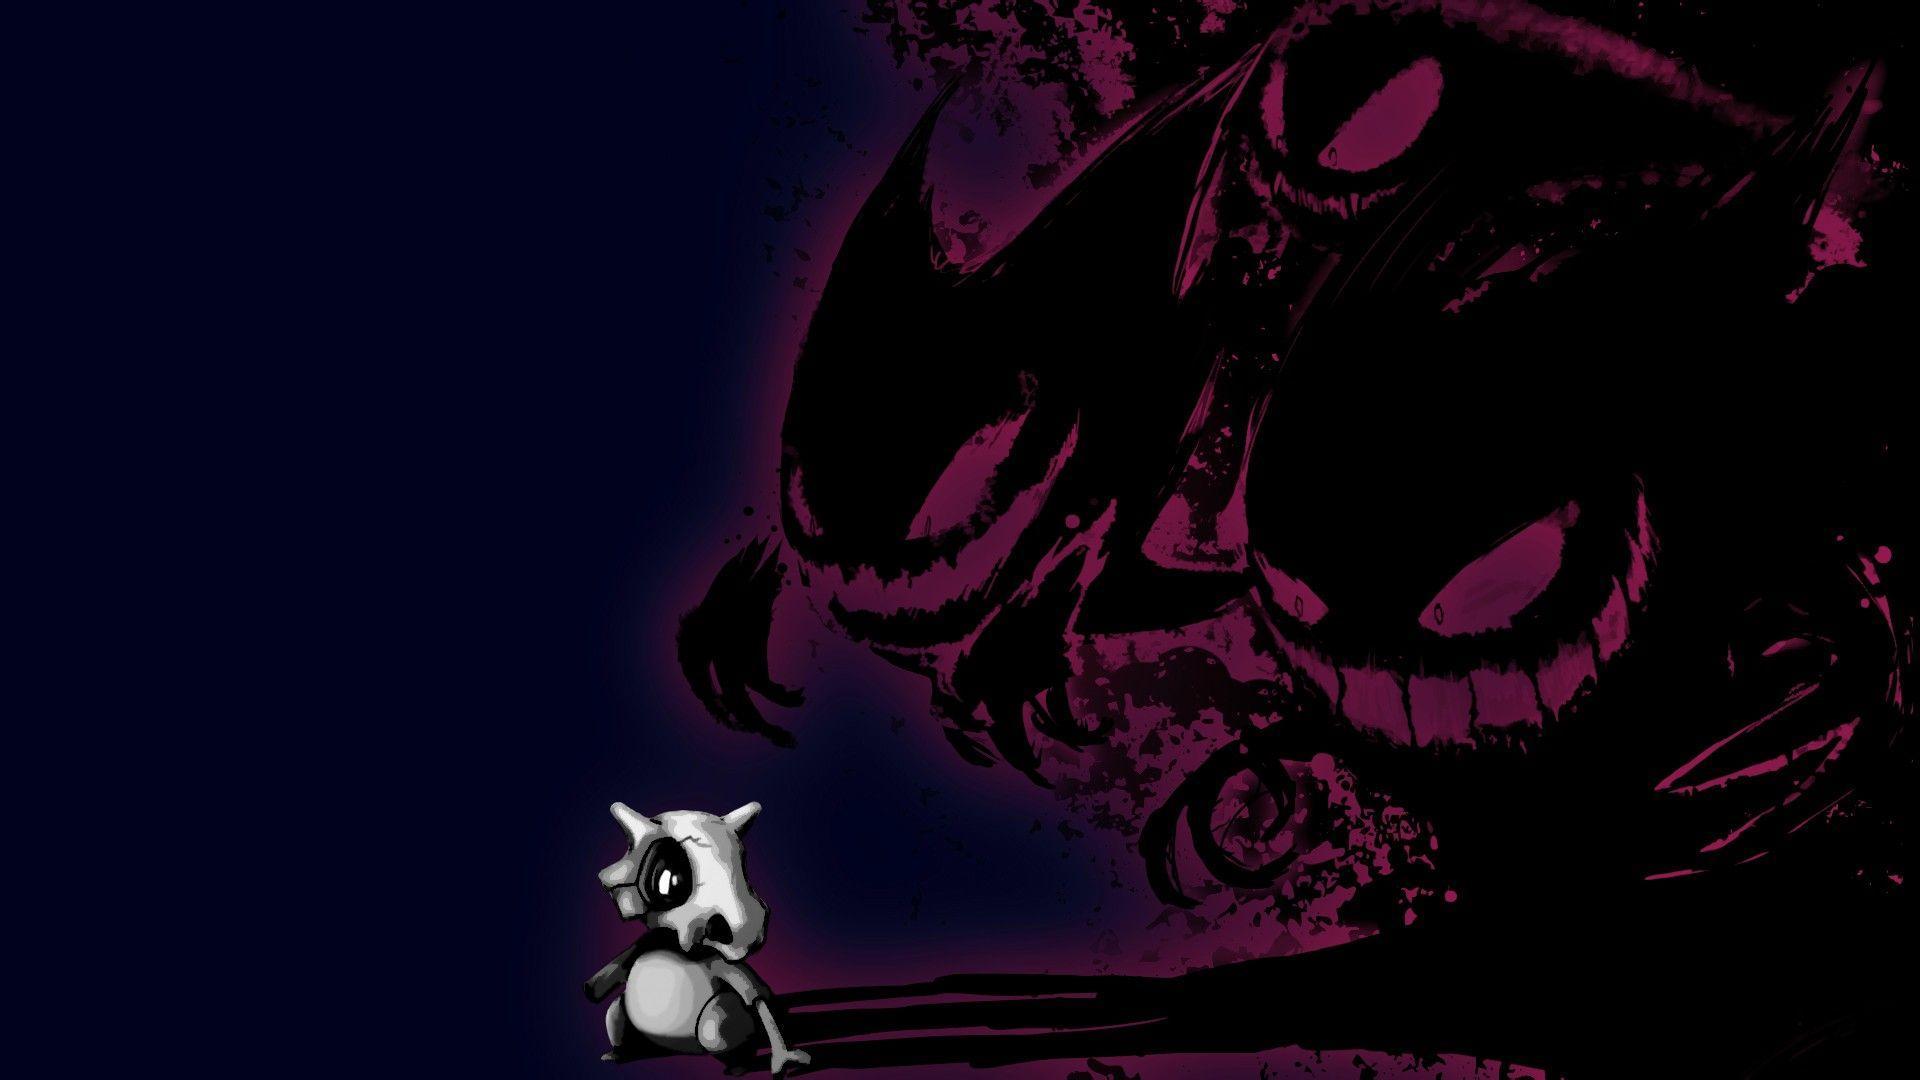 Dark Pokemon Wallpapers Wallpaper Cave